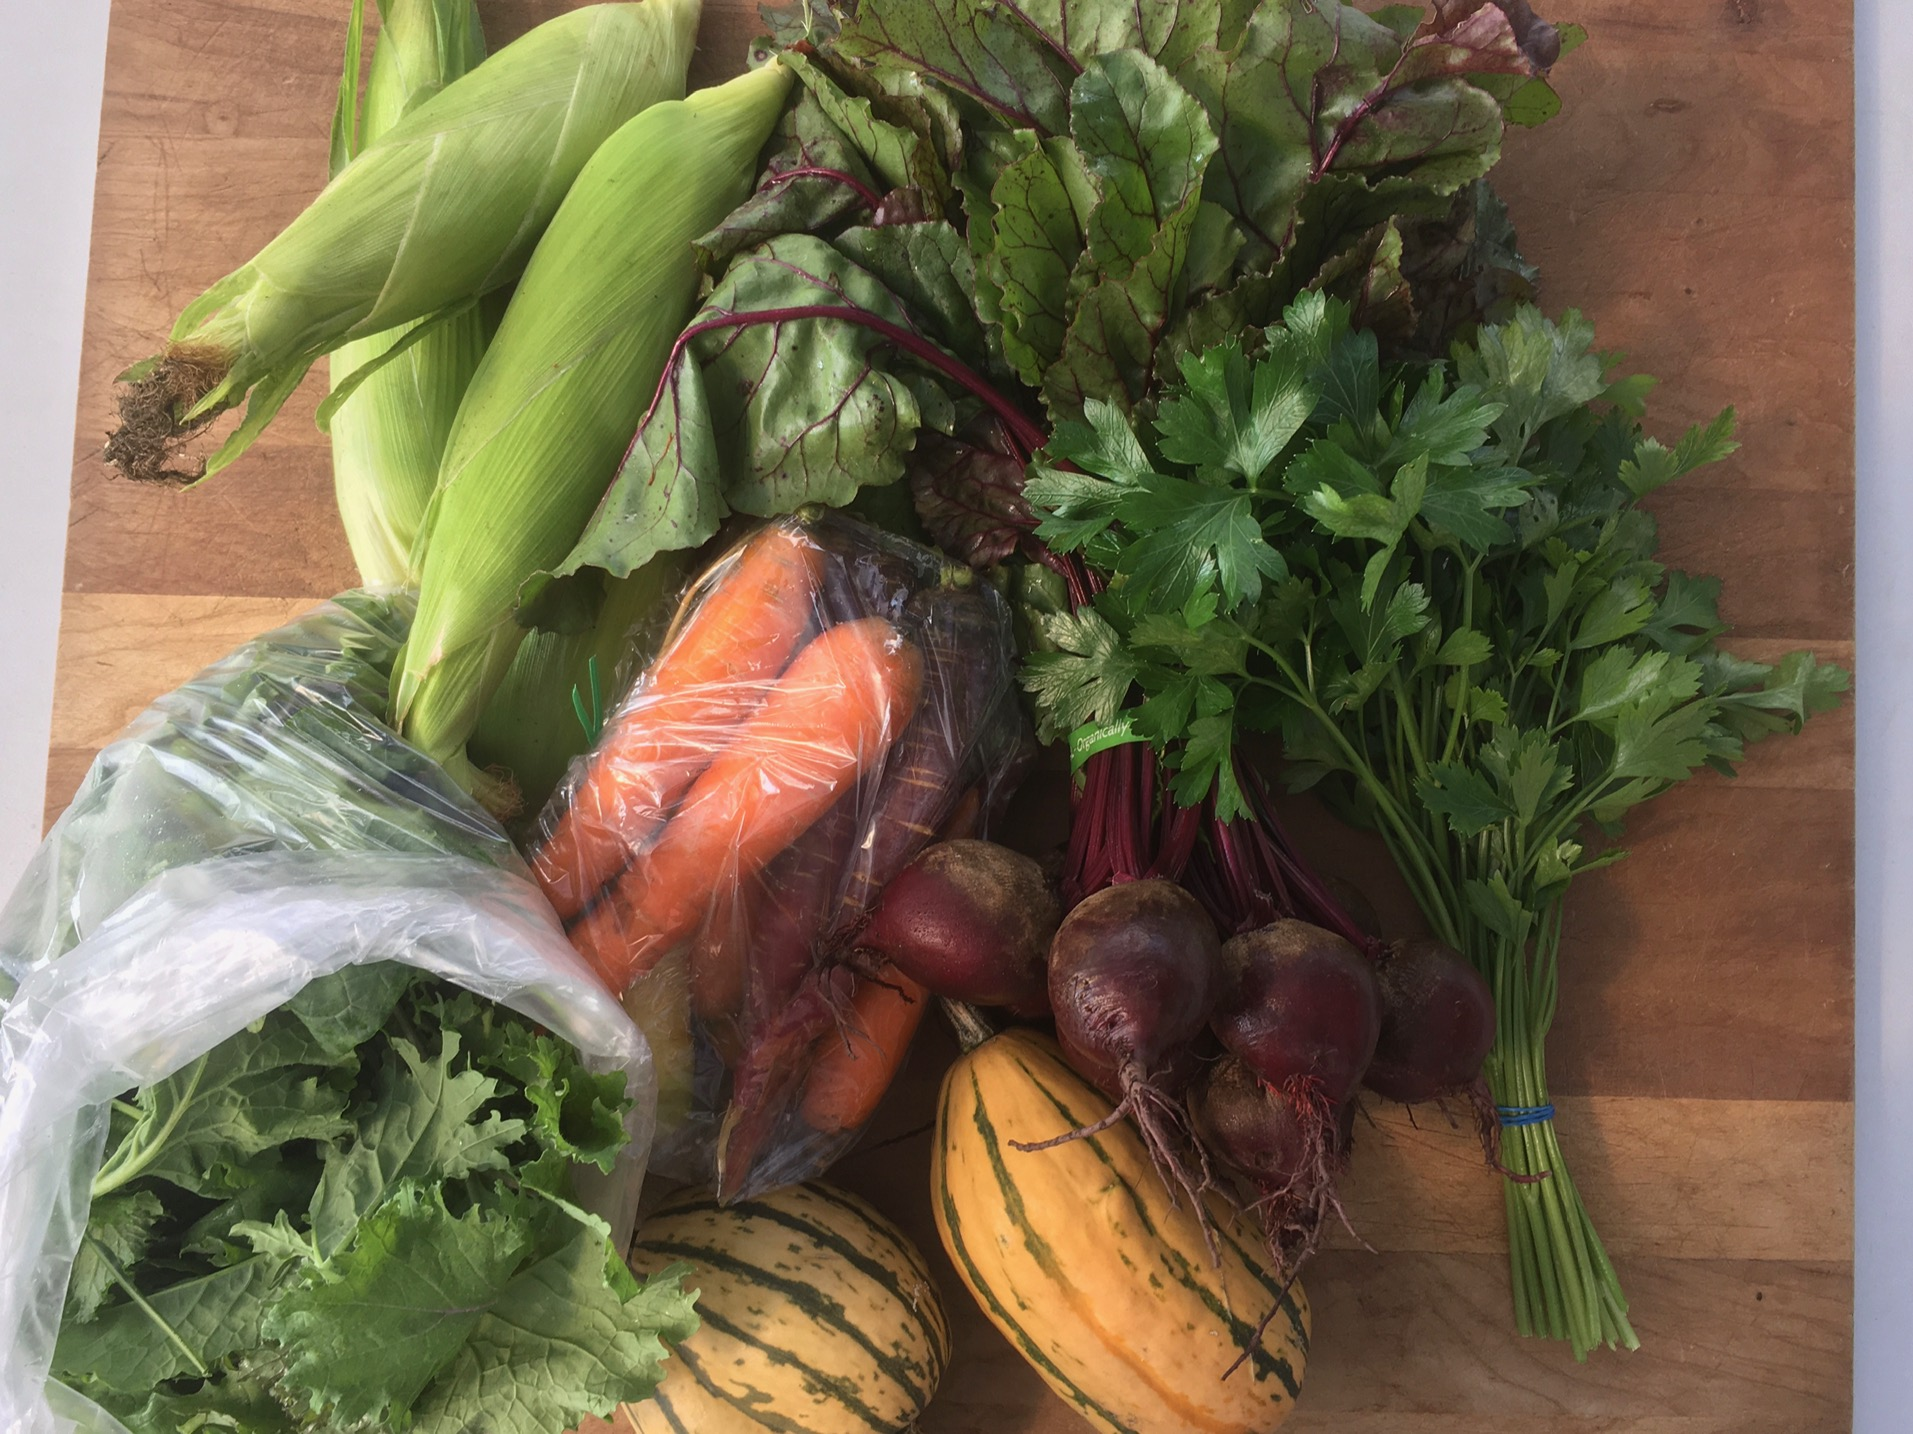 Veggie Share: Small Veggie Share